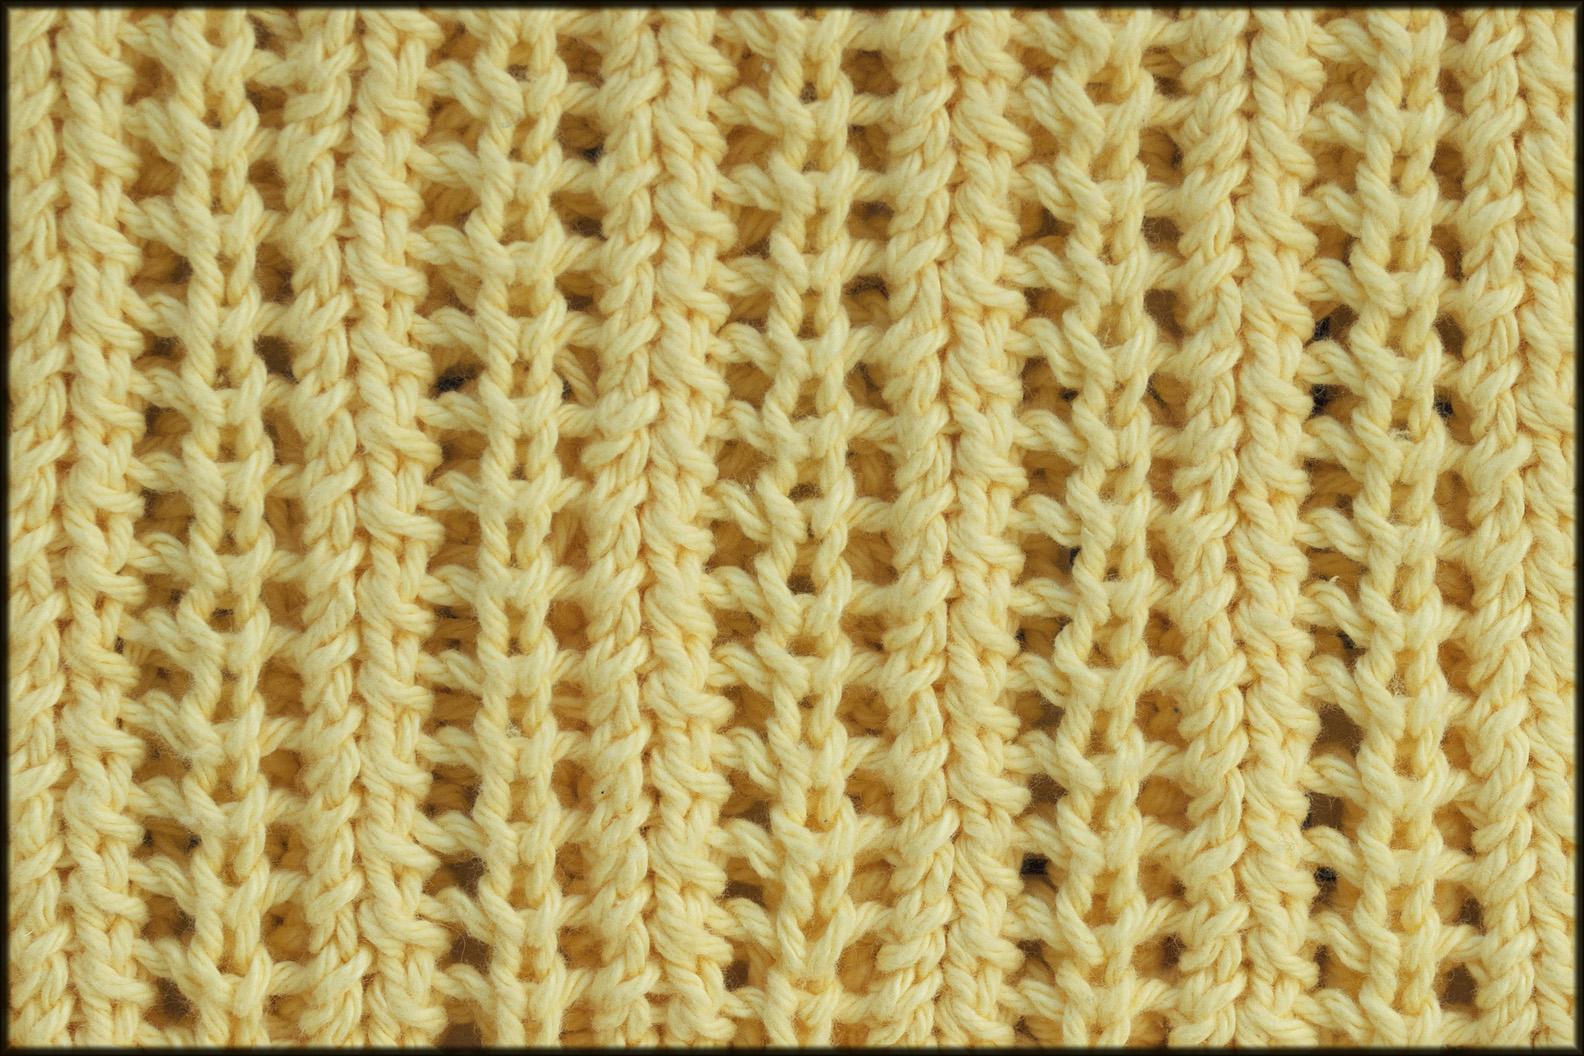 Basic Knitting Stitches Ssk : Wyndlestraw Designs: Market Bag Knit-along #6 - The Two-Row SSK